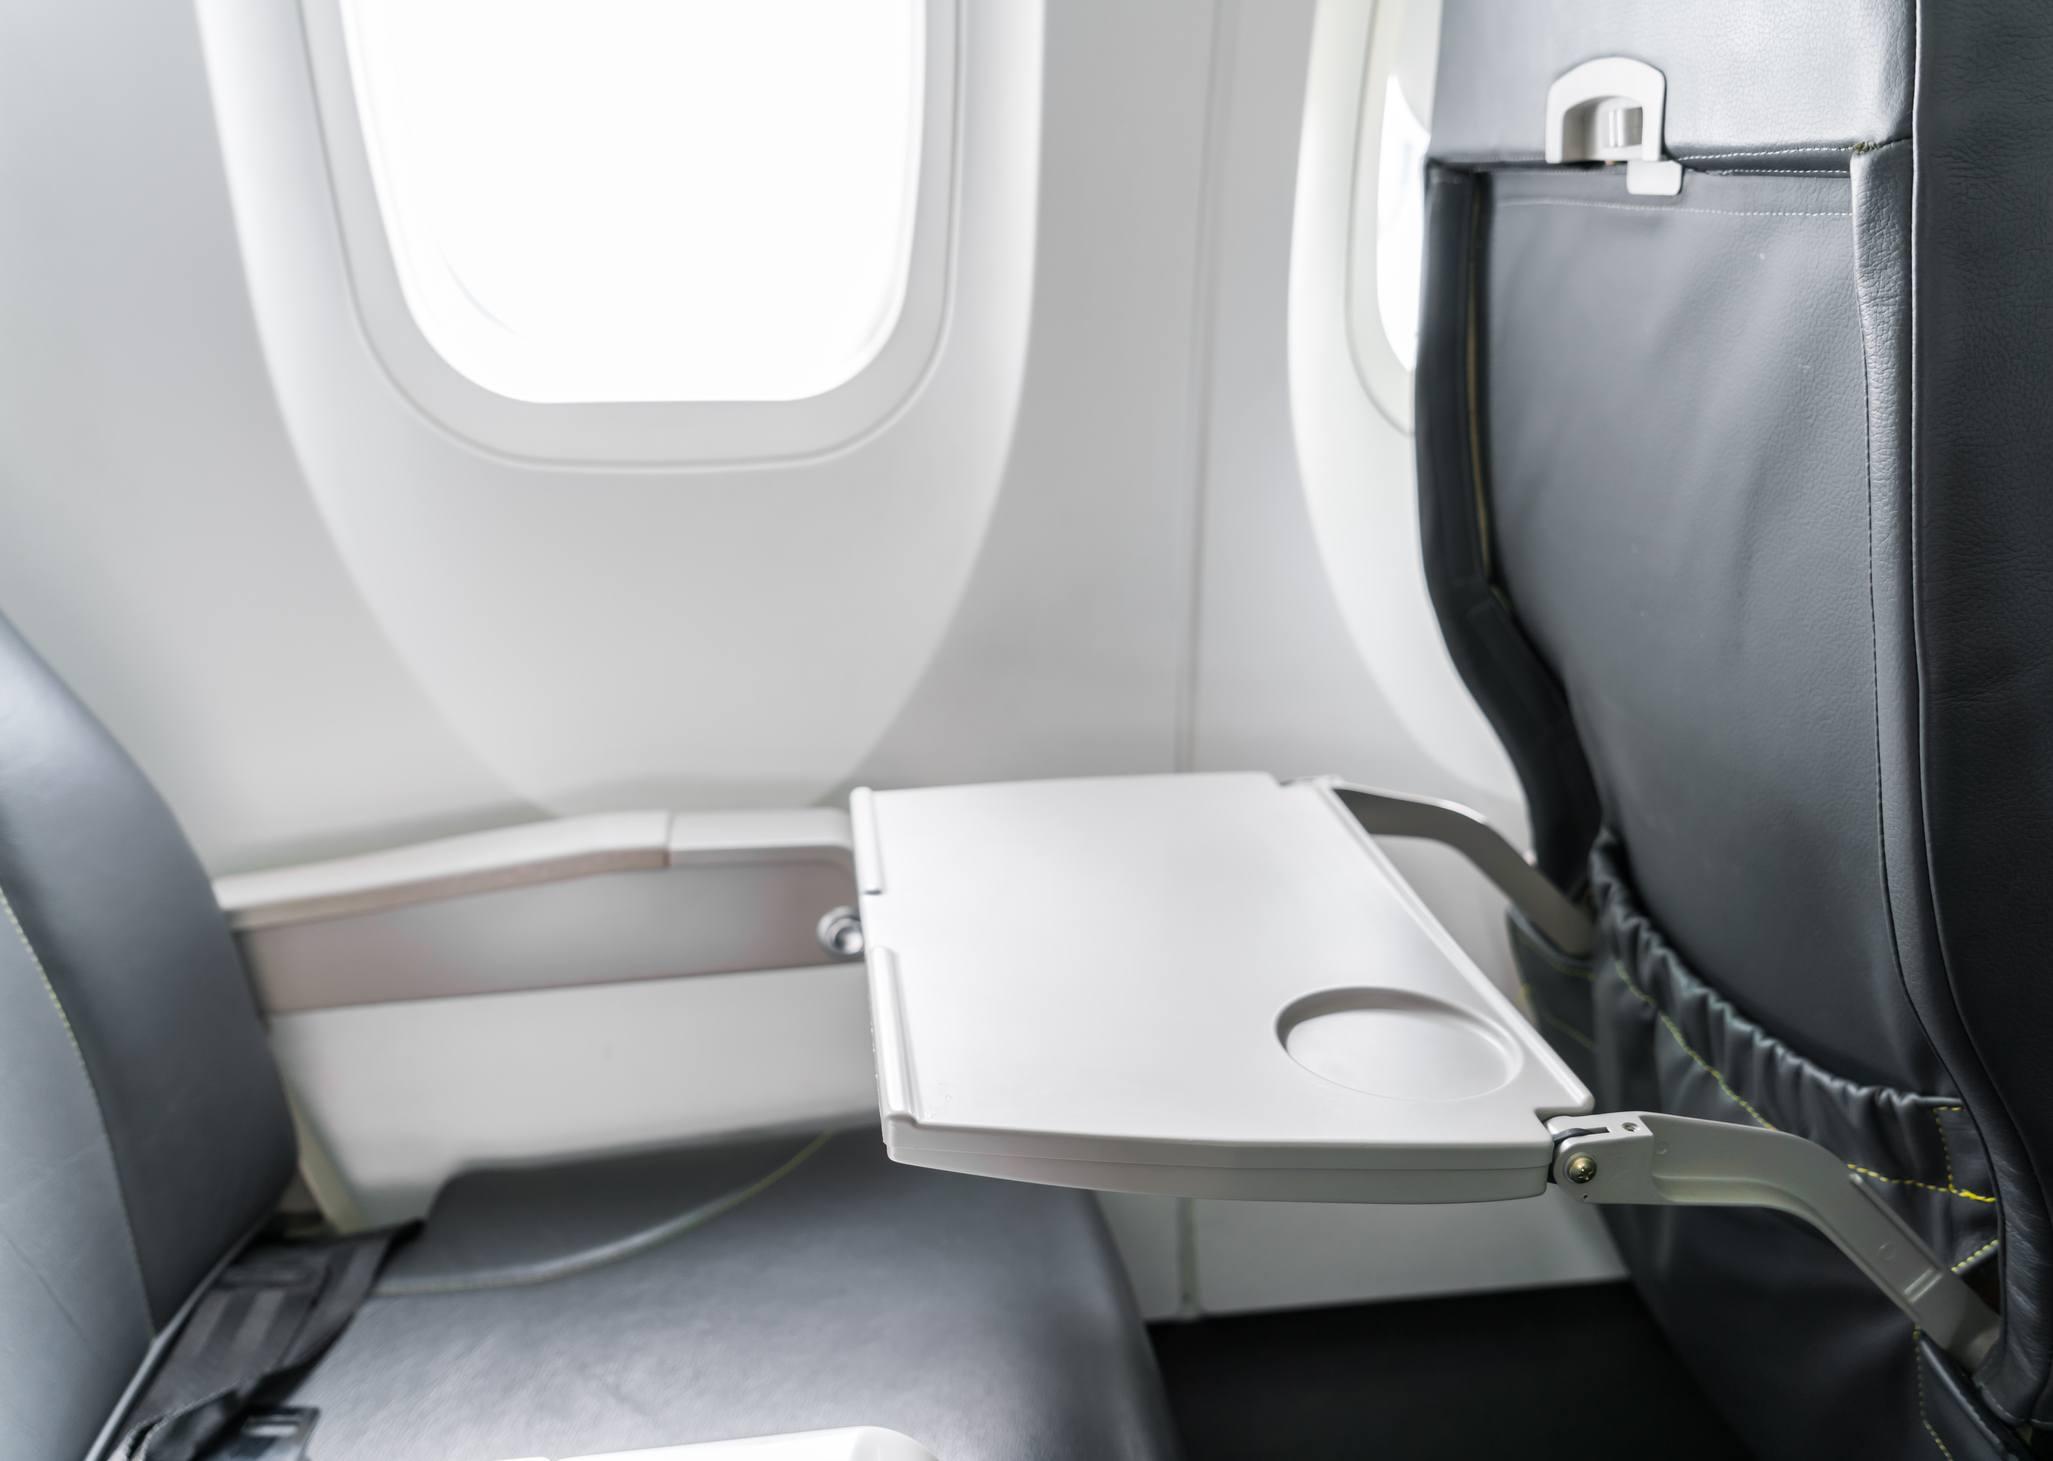 Tray on back of aeroplane seat